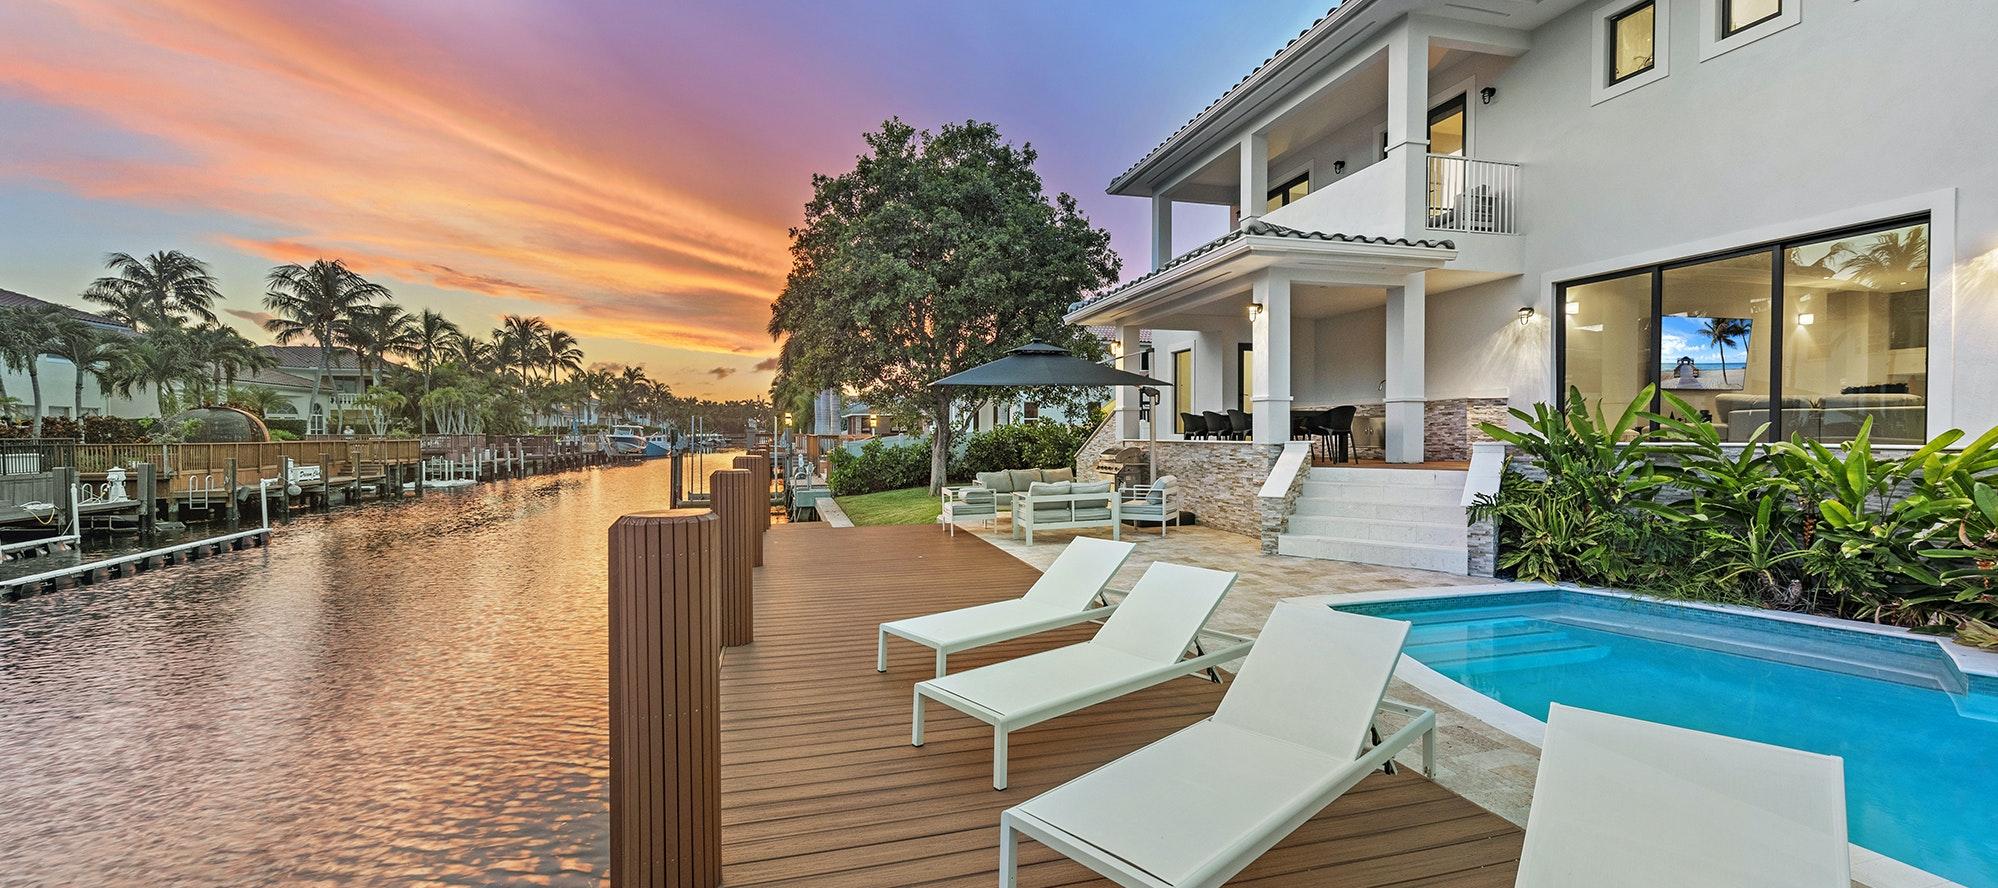 Villa Costa luxury rental in Hollywood